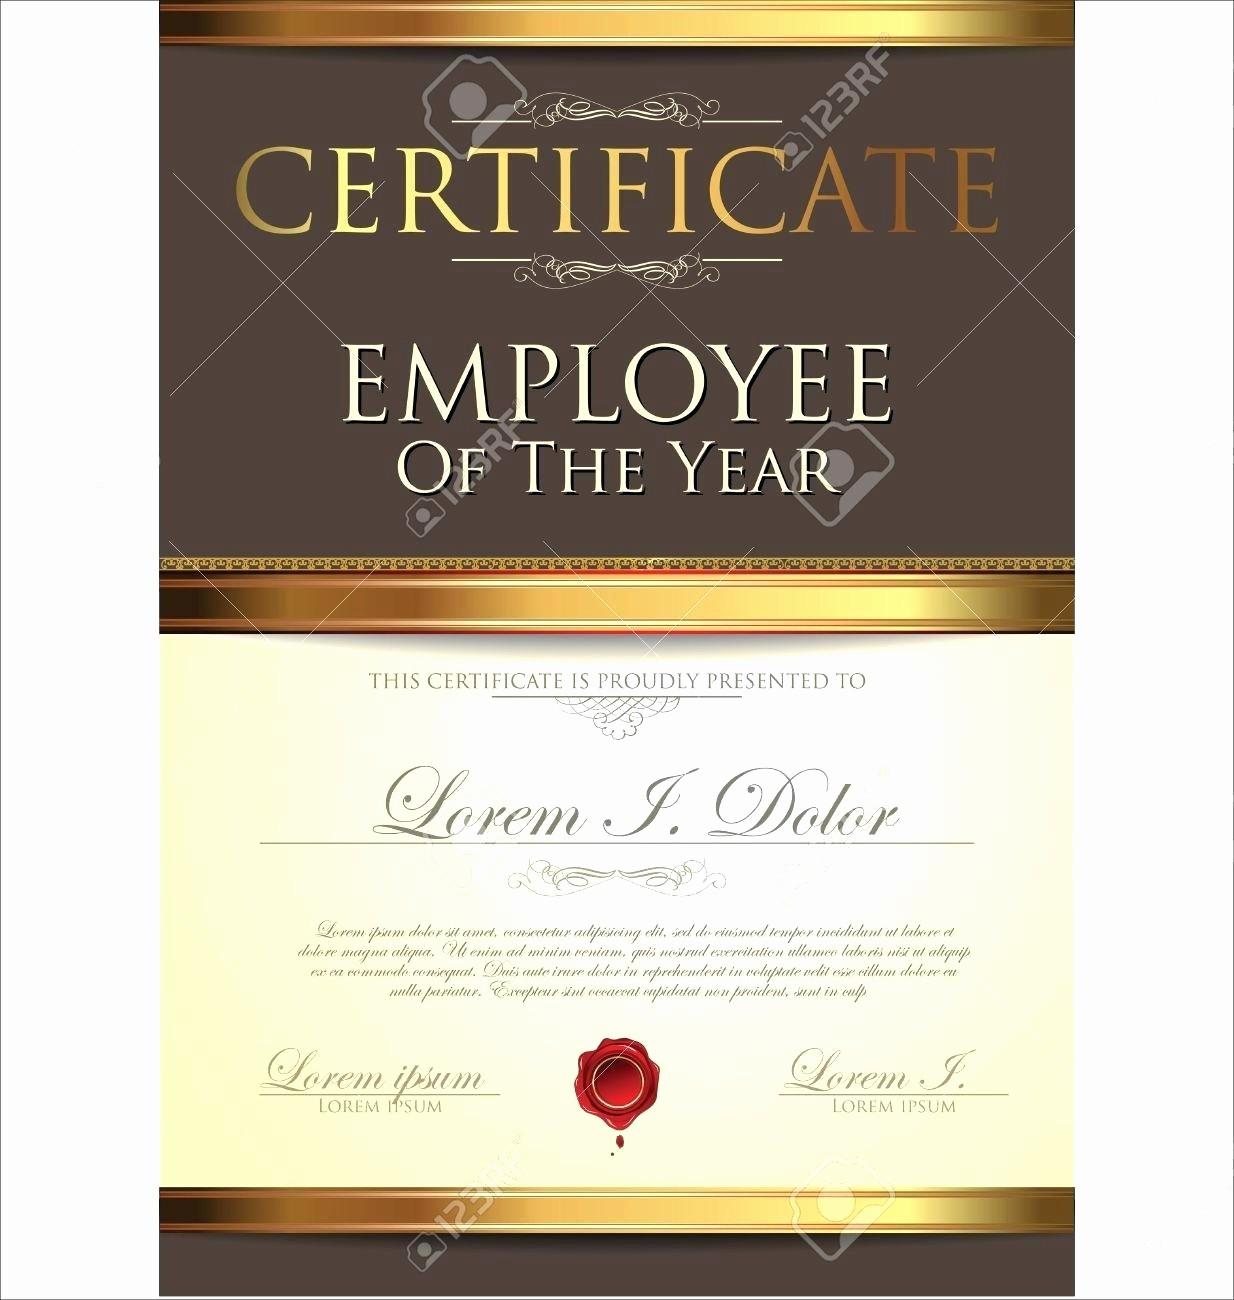 Employee Of the Year Certificates Elegant Template Employee Appreciation Certificate Template